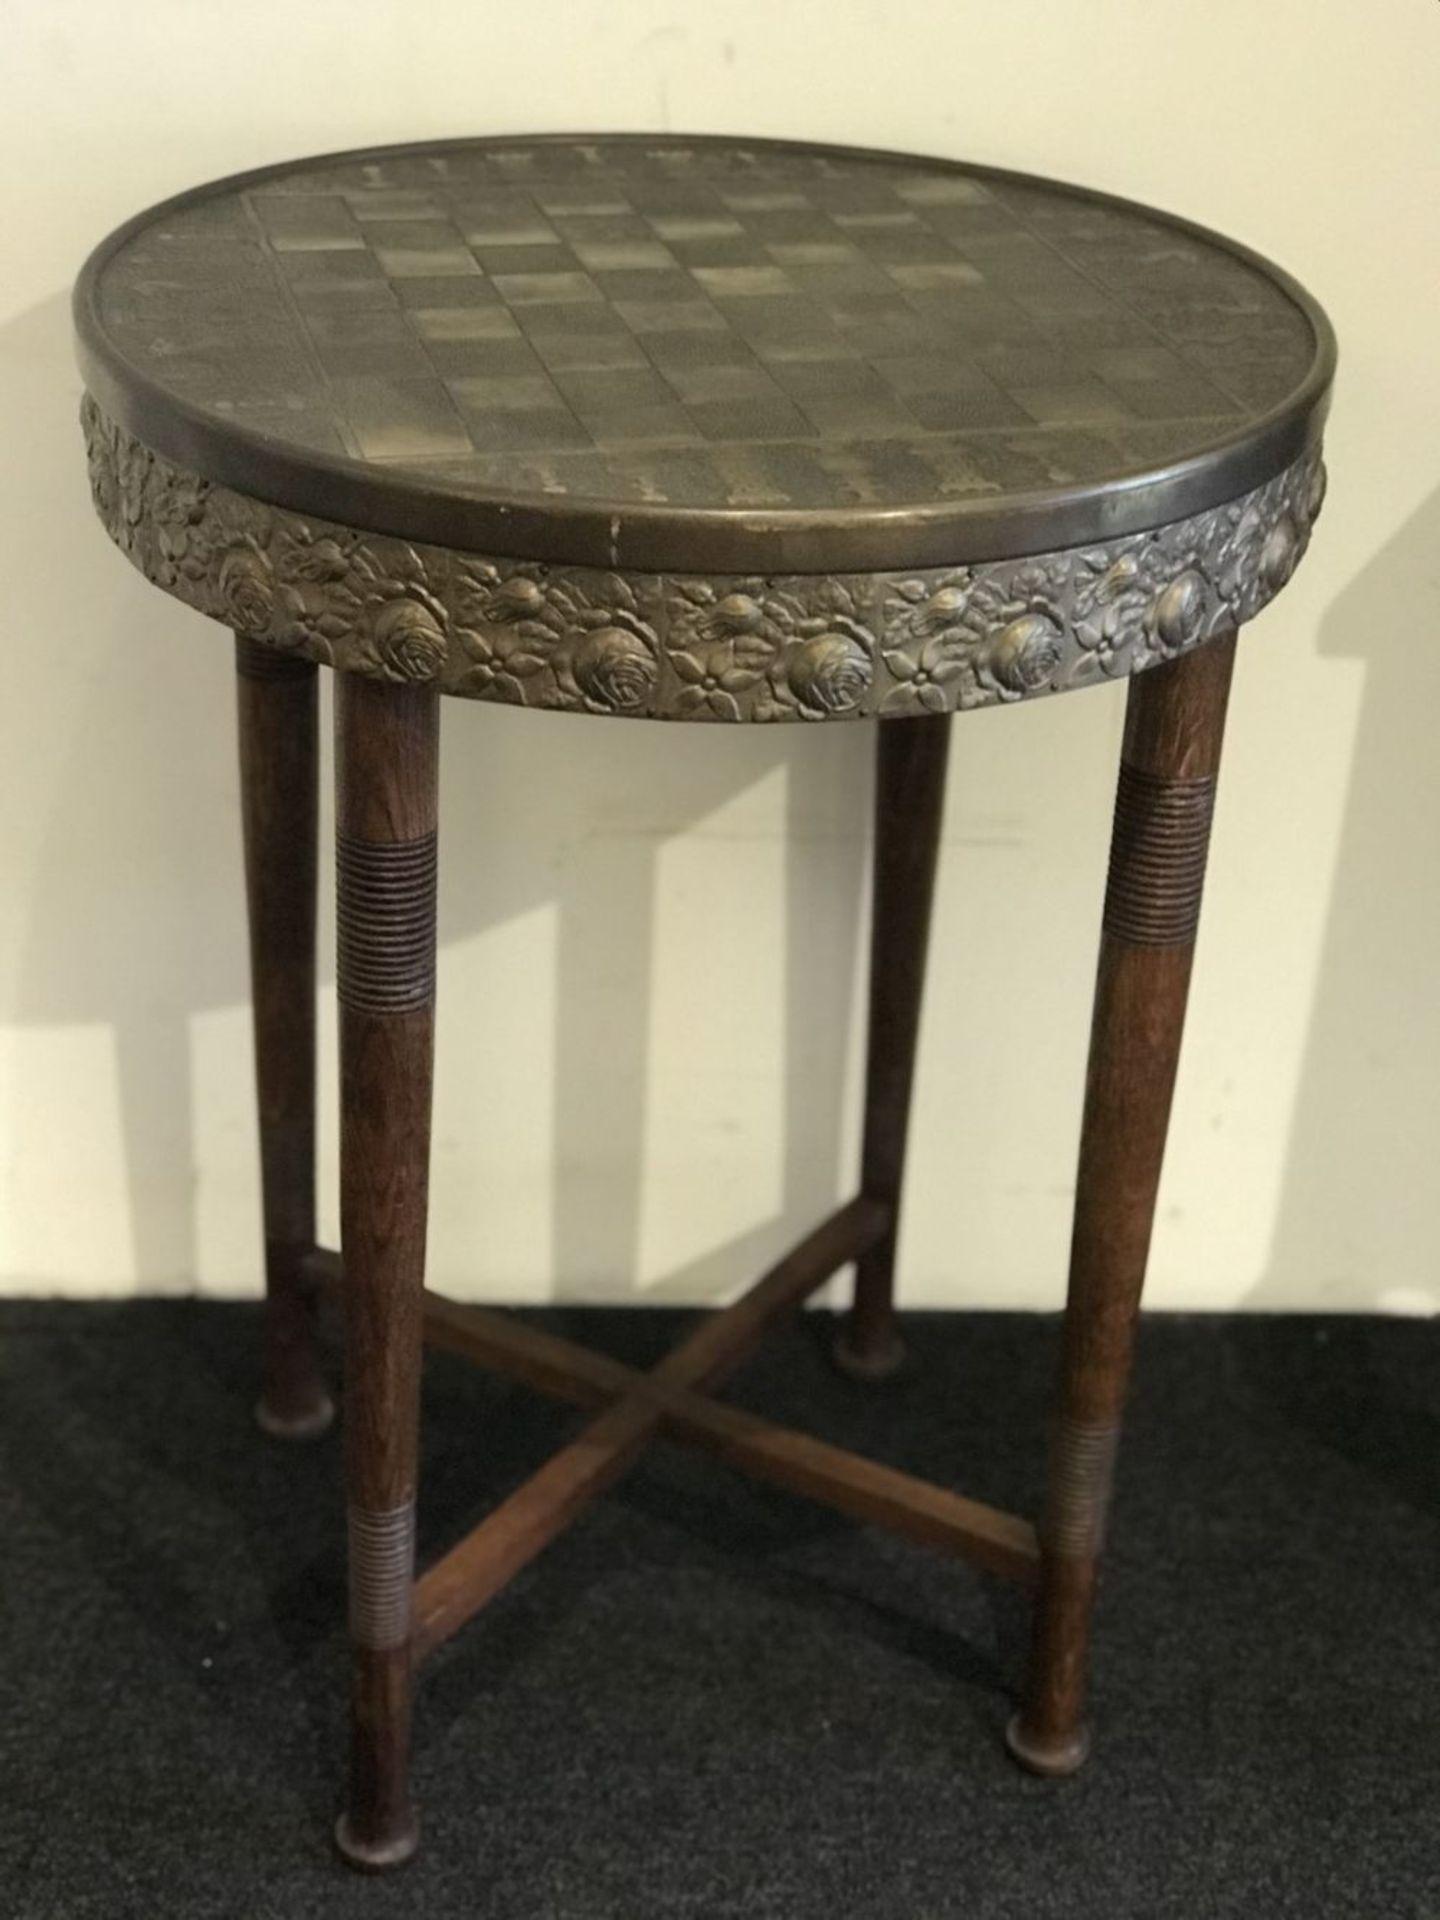 Los 116 - De Coene chess table H 73 dia 55 cm